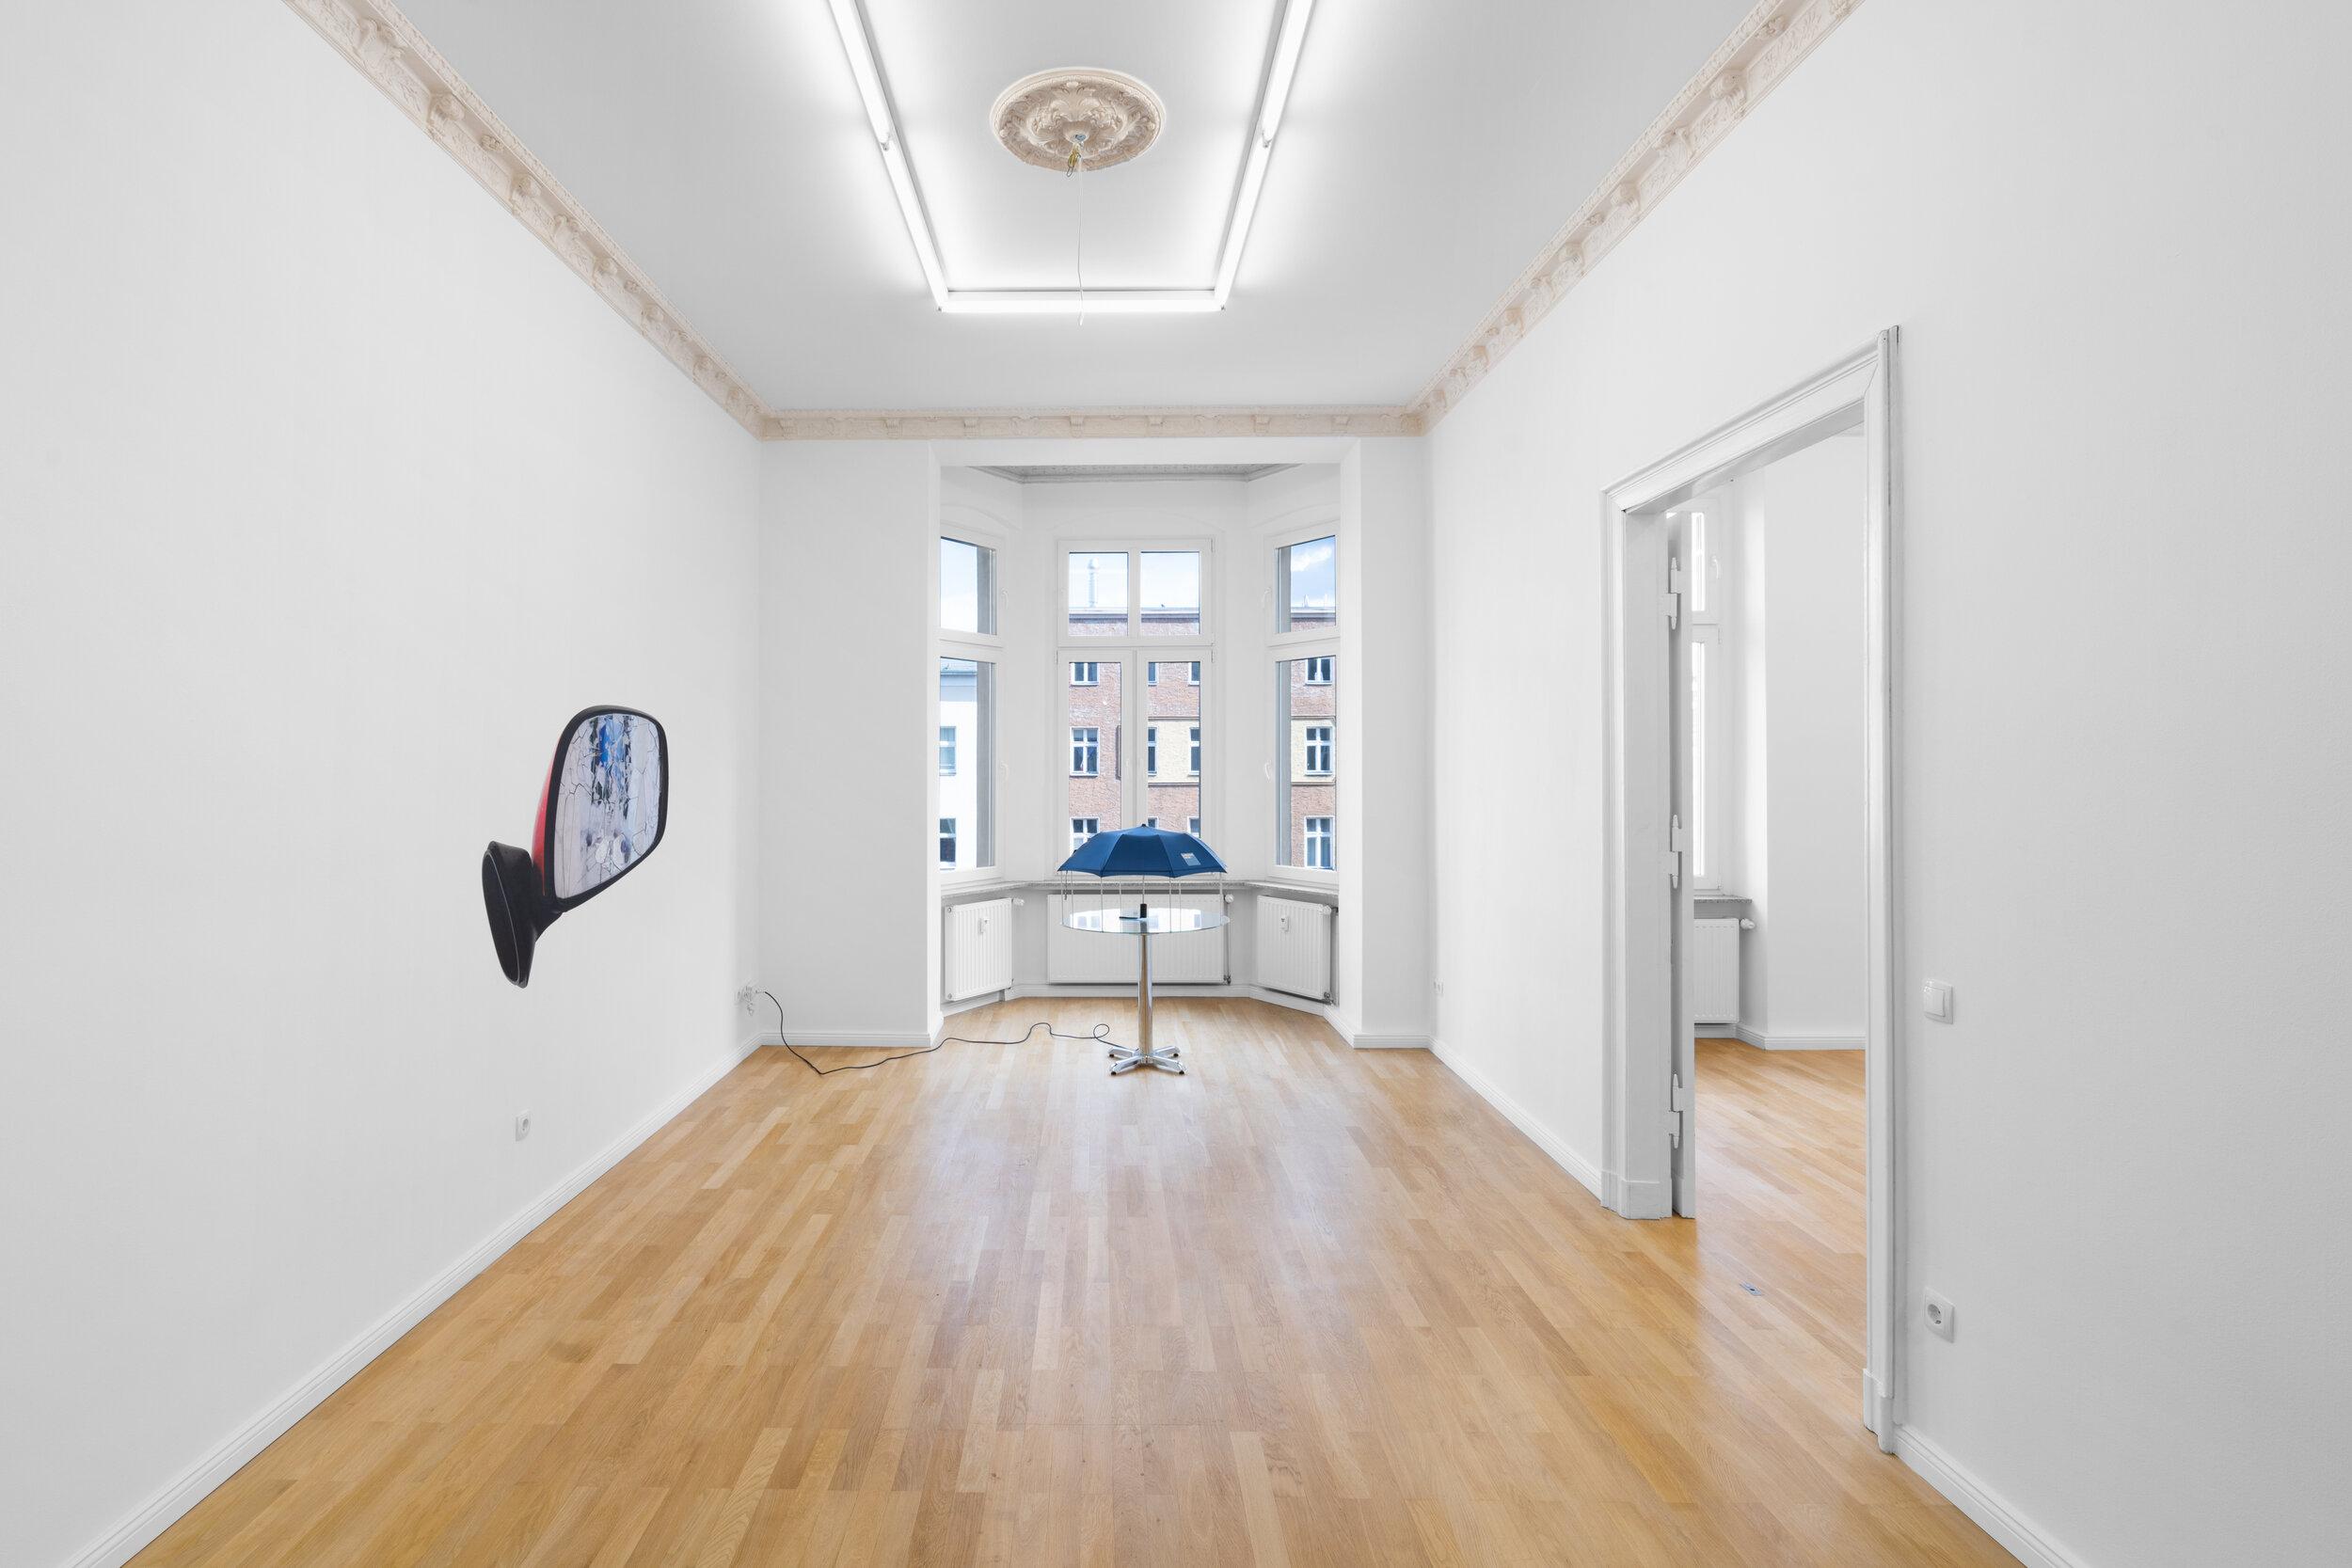 Installation view,  Andrew J. Greene, Madeline Hollander, Asha Schechter  Left: Asha Schechter,  Prius mirror from Baby Barcelona , 2019 Center: Andrew J. Greene,  Umbrella Dryer (Goldman Sachs) , 2017/2019